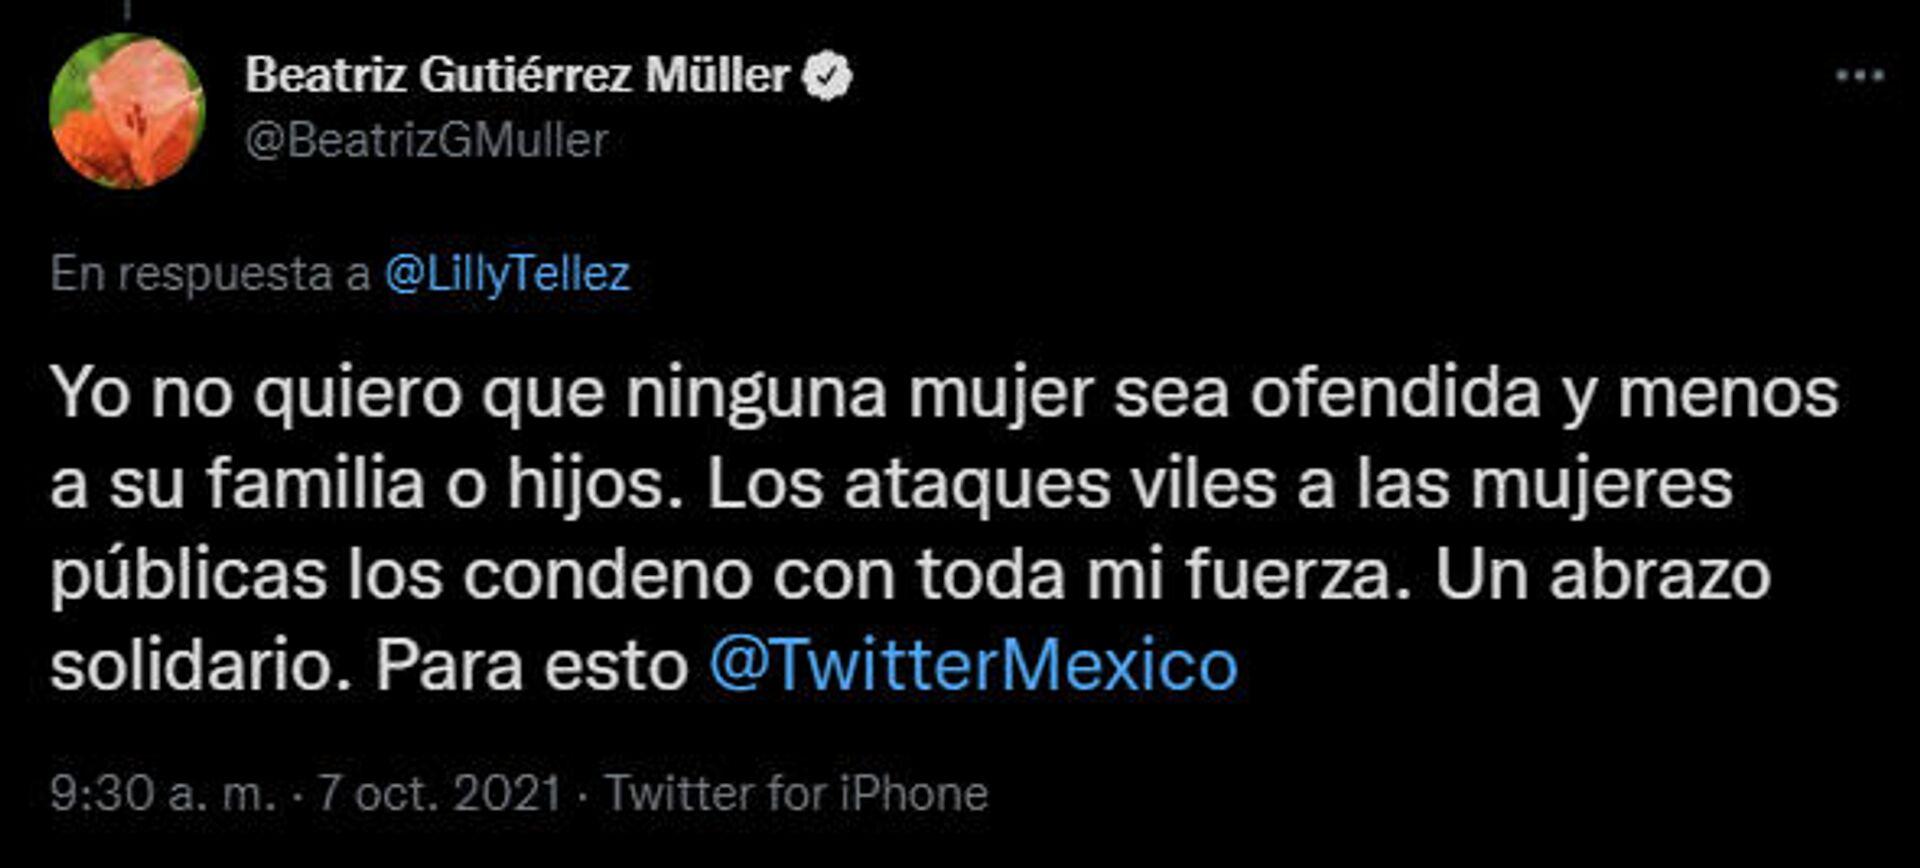 Tuit de Beatriz Gutiérrez Müller a Lilly Téllez  - Sputnik Mundo, 1920, 07.10.2021